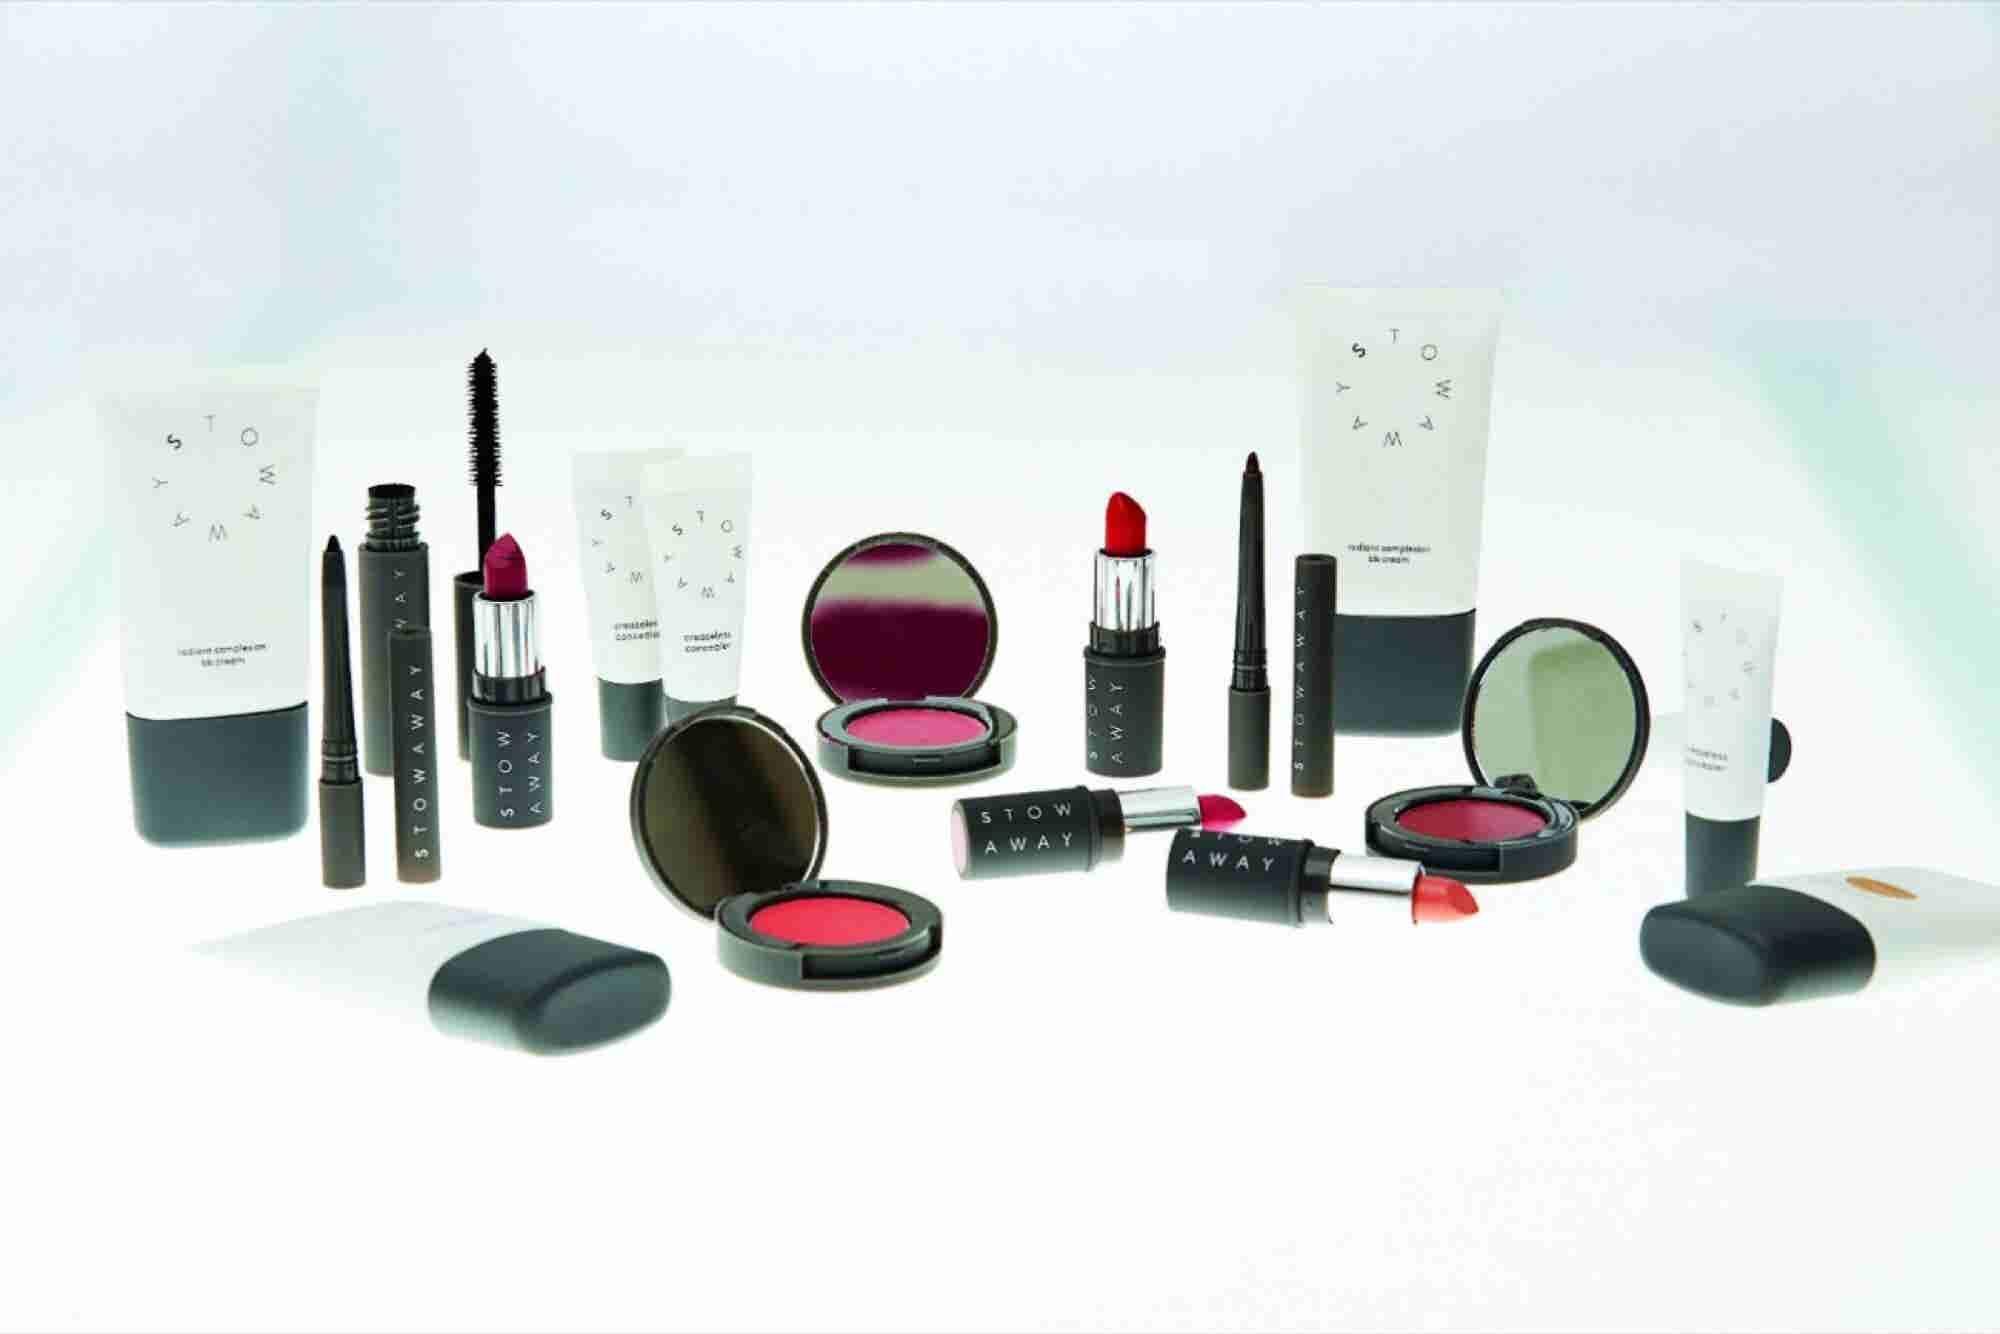 Stowaway Cosmetics: perfección miniatura